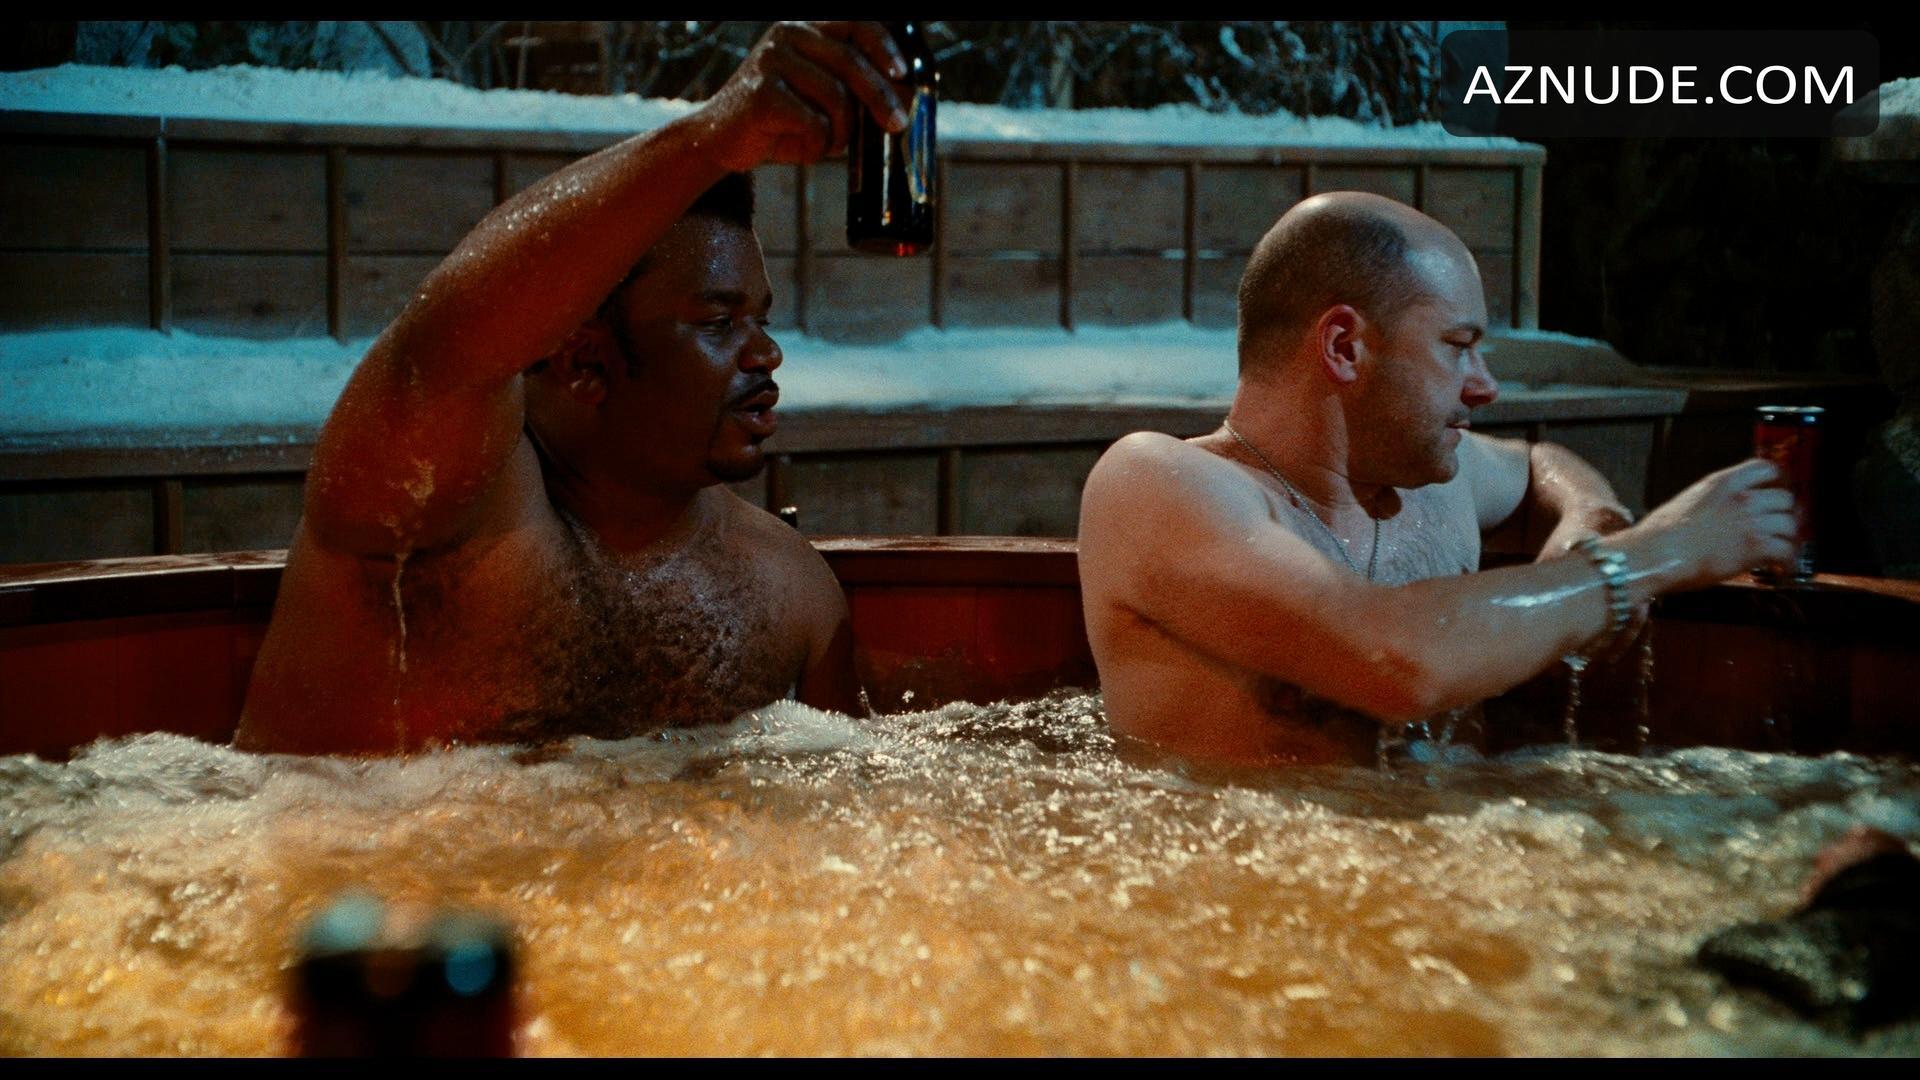 Hot tub time machine sexy